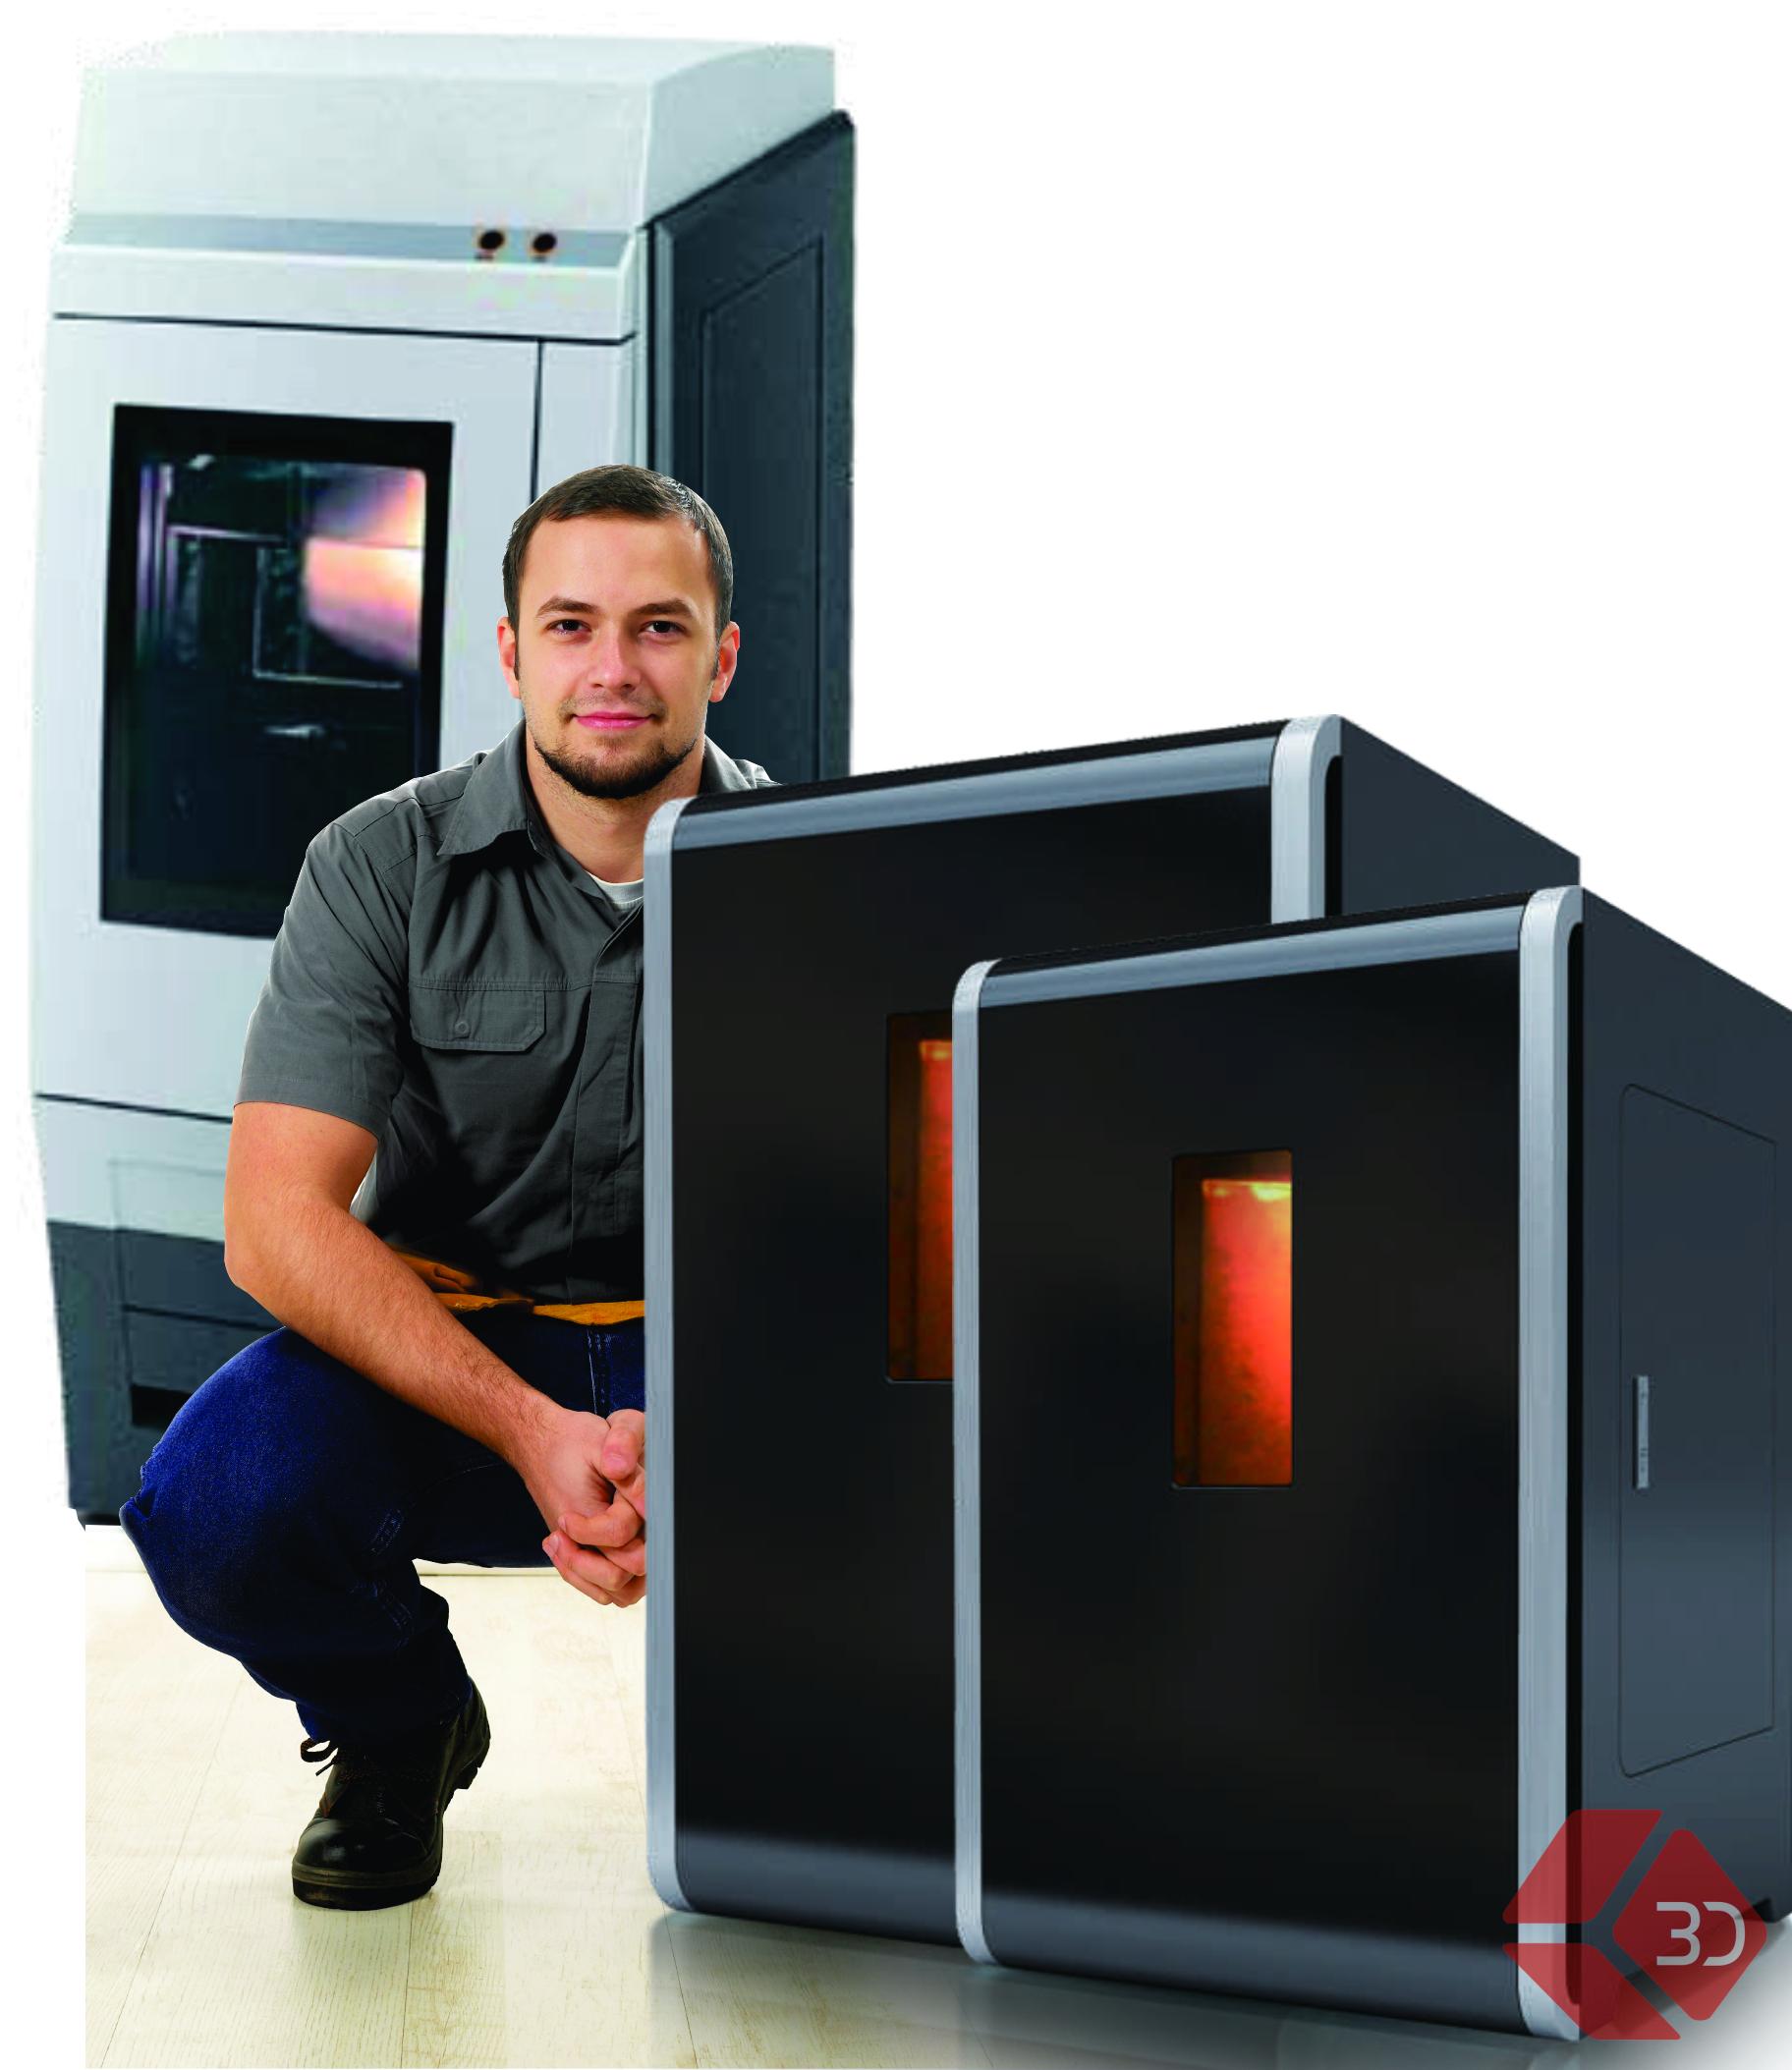 Inspire 3D printers